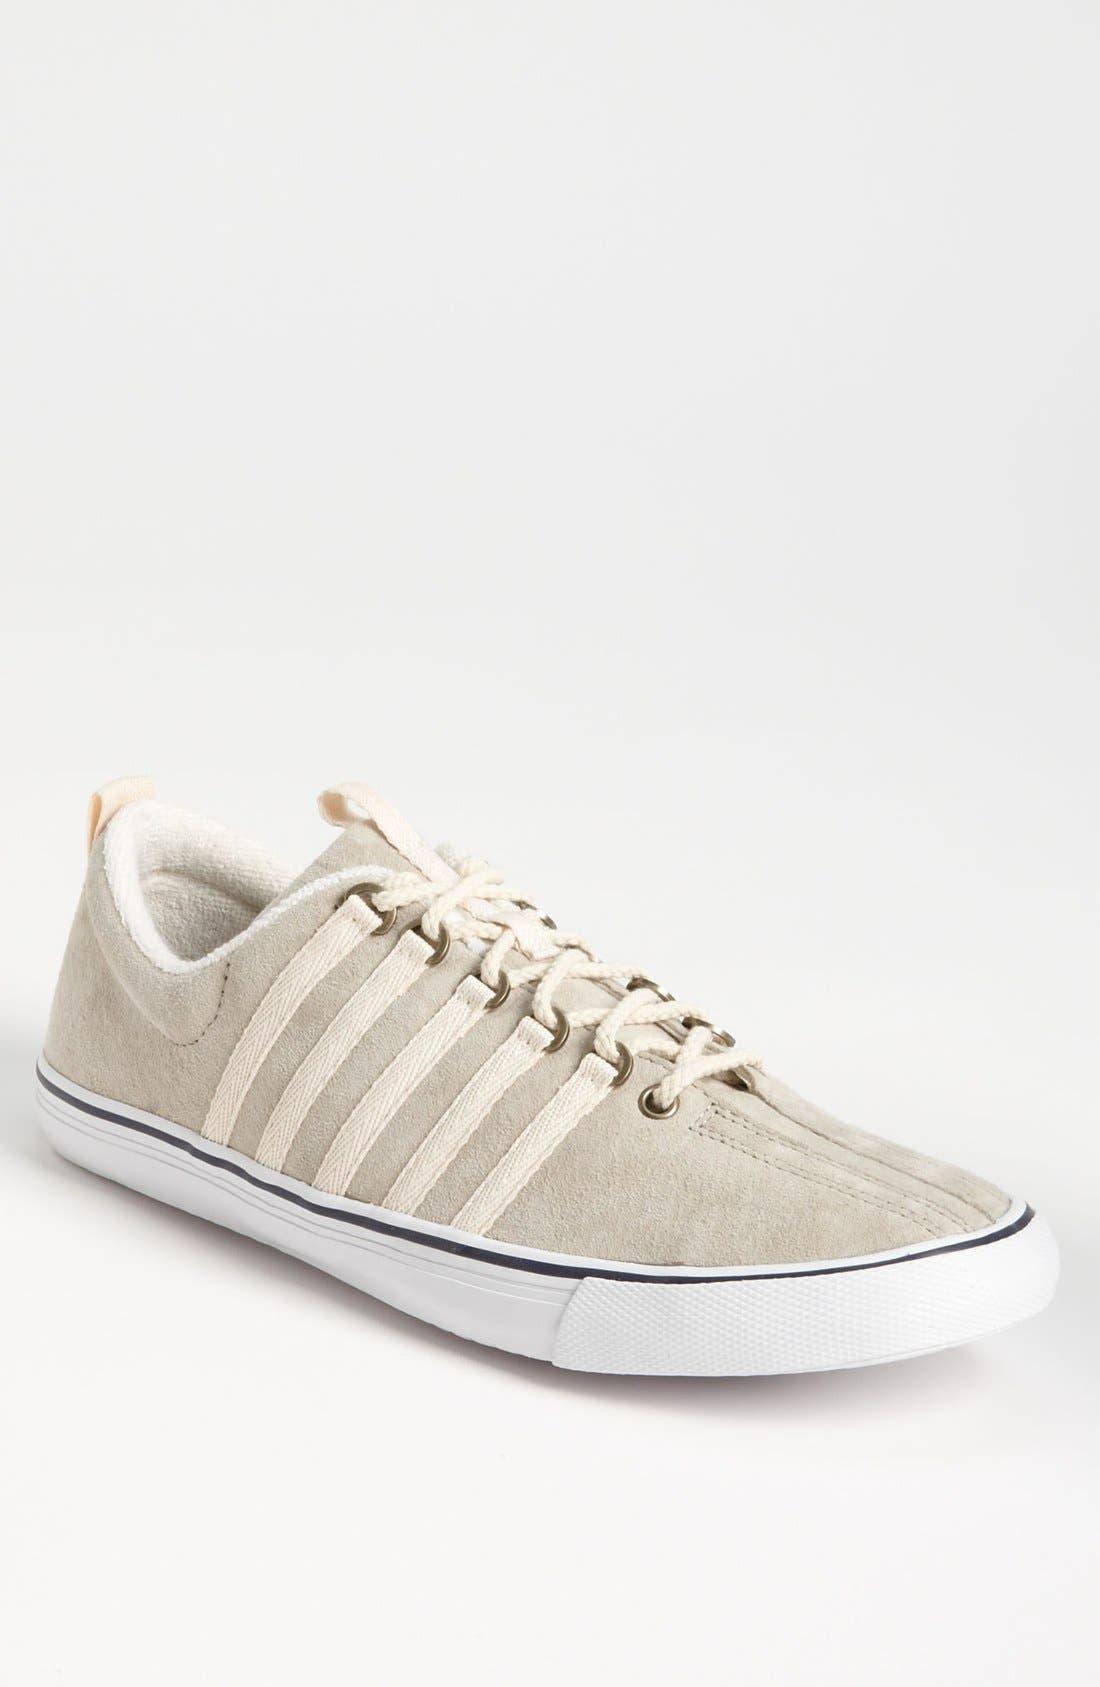 Alternate Image 1 Selected - K-Swiss 'Billy Reid Venice' Suede Sneaker (Men)